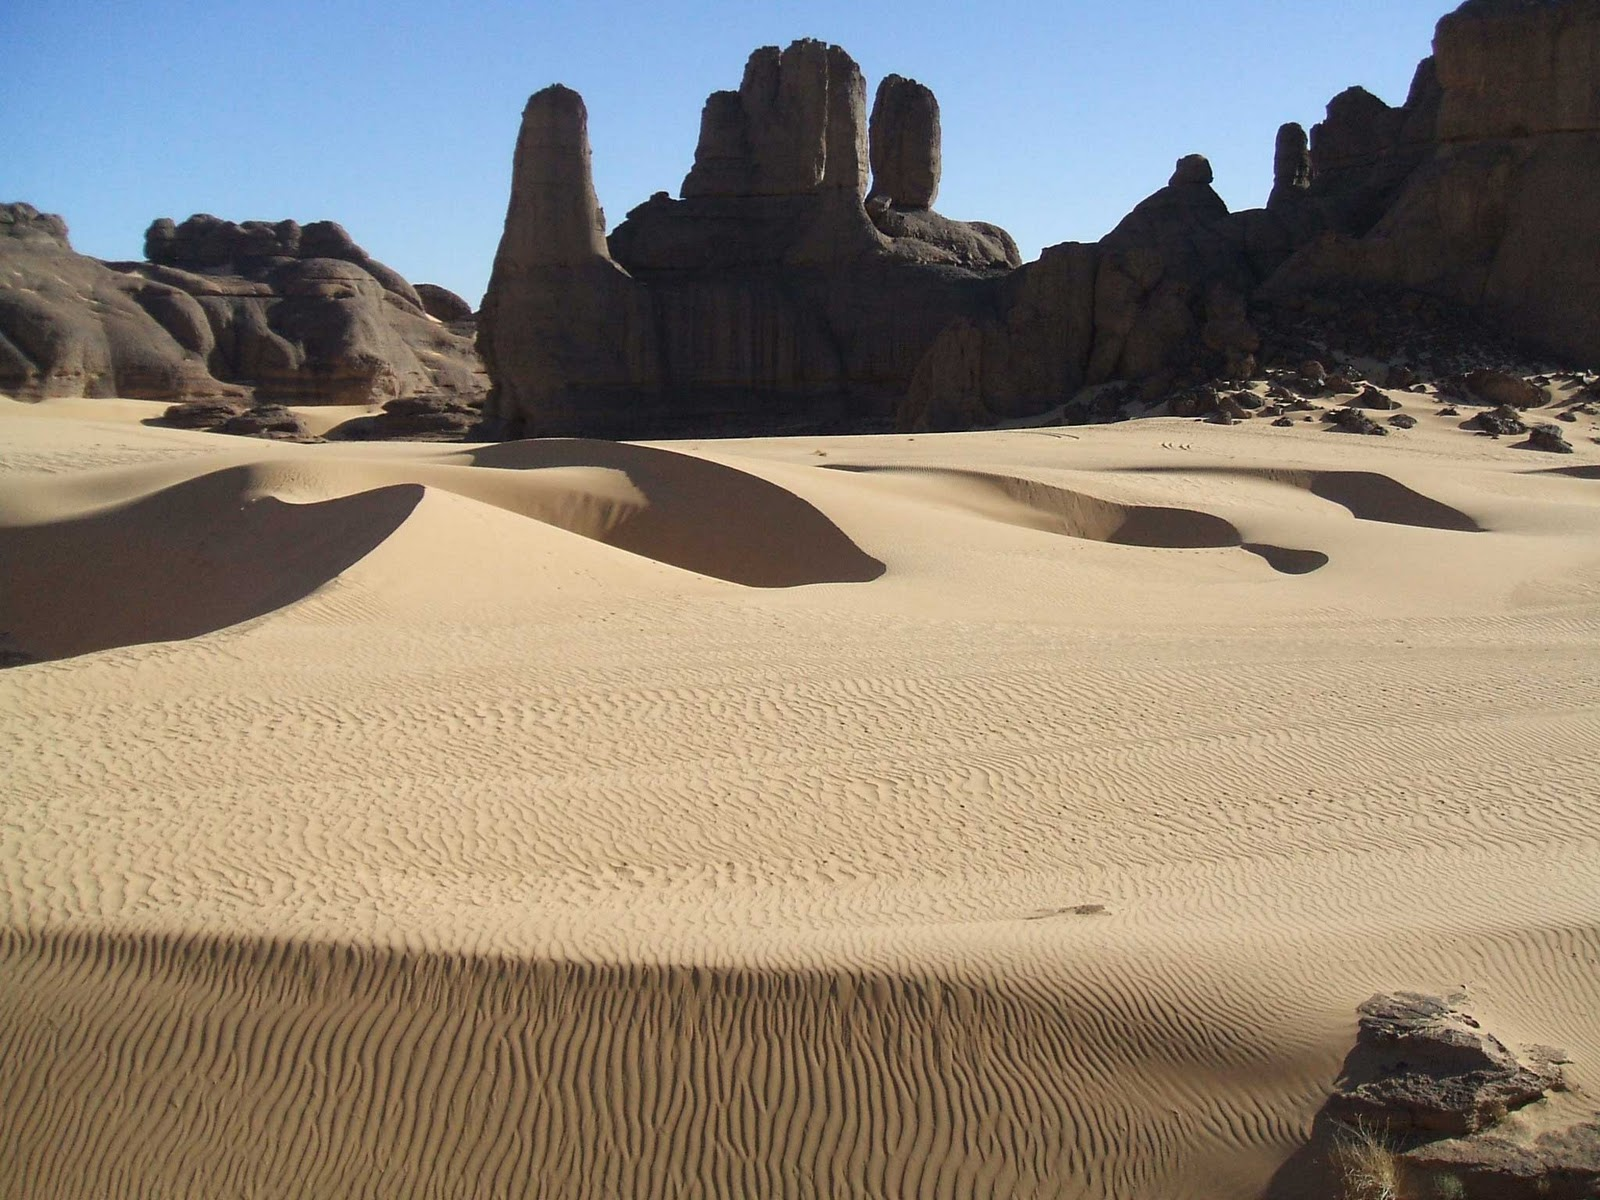 La maravillosa vida de sara alondra quevedo cuevas - 3 part 7